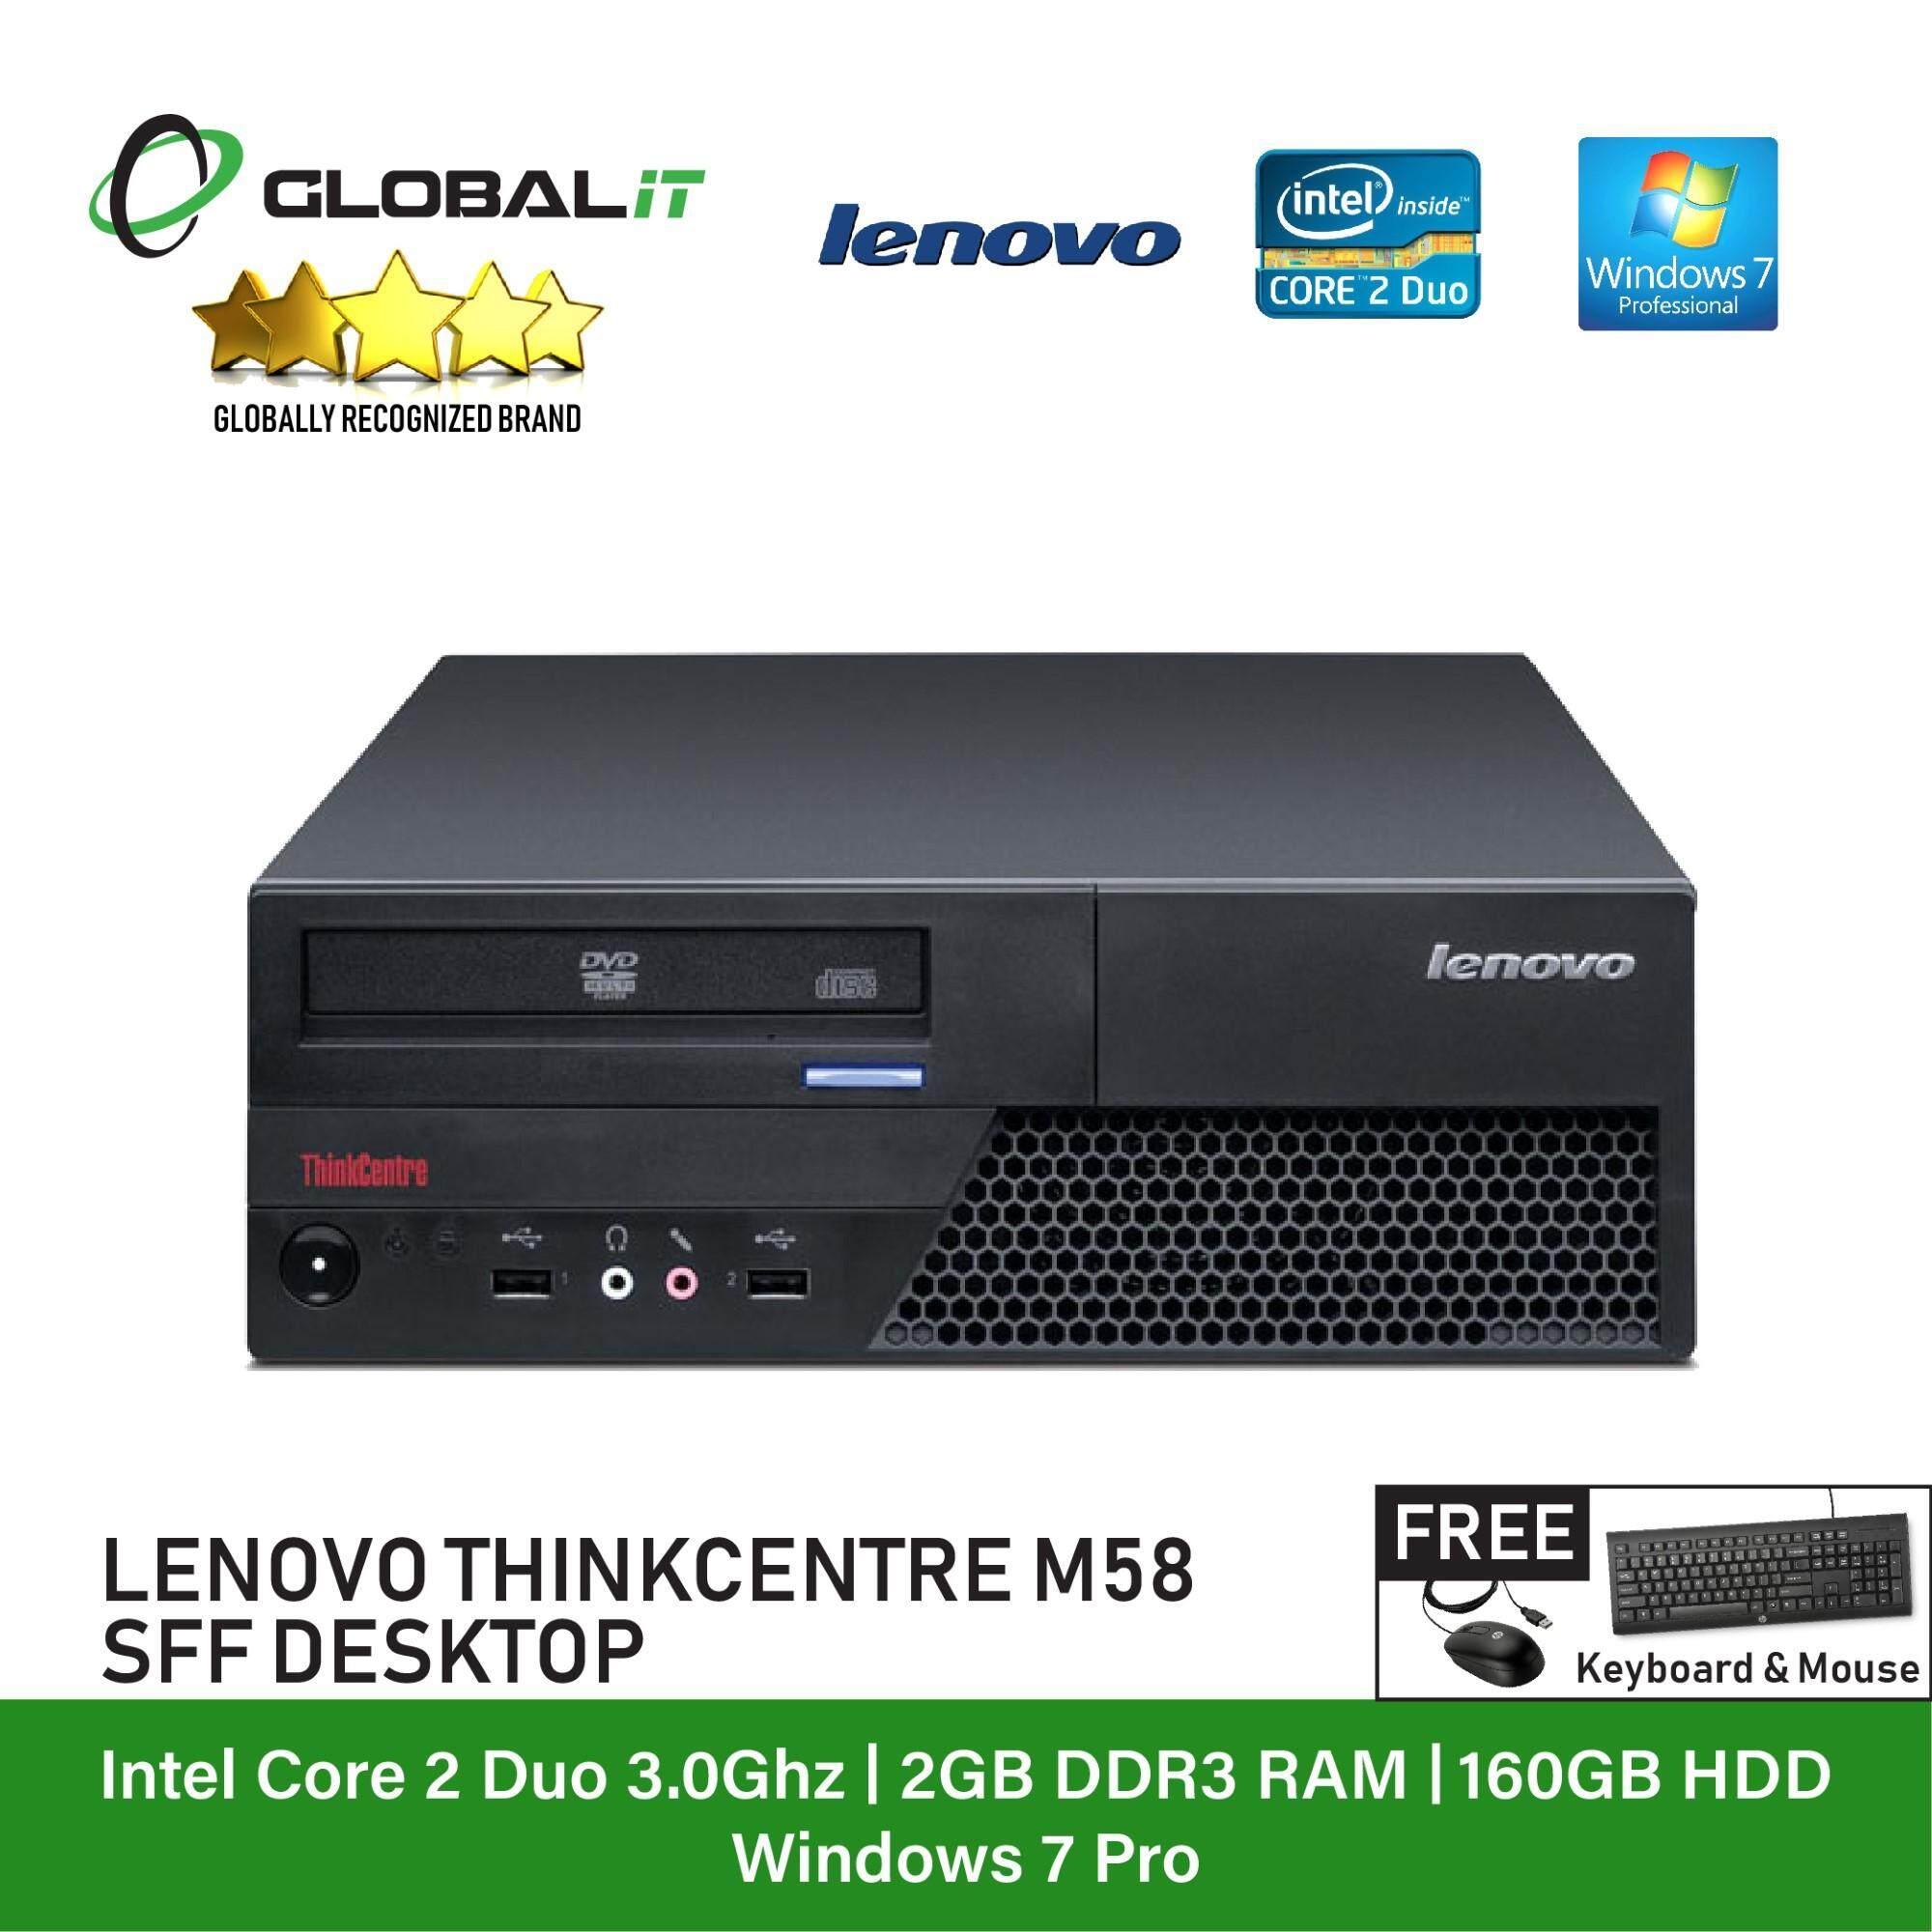 (Refurbished Desktop) Lenovo ThinkCentre M58 type 6234 SFF / Intel Core 2  Duo / 160GB Hard Disk / 2GB Ram / DVD Writer / Windows 7 Professional